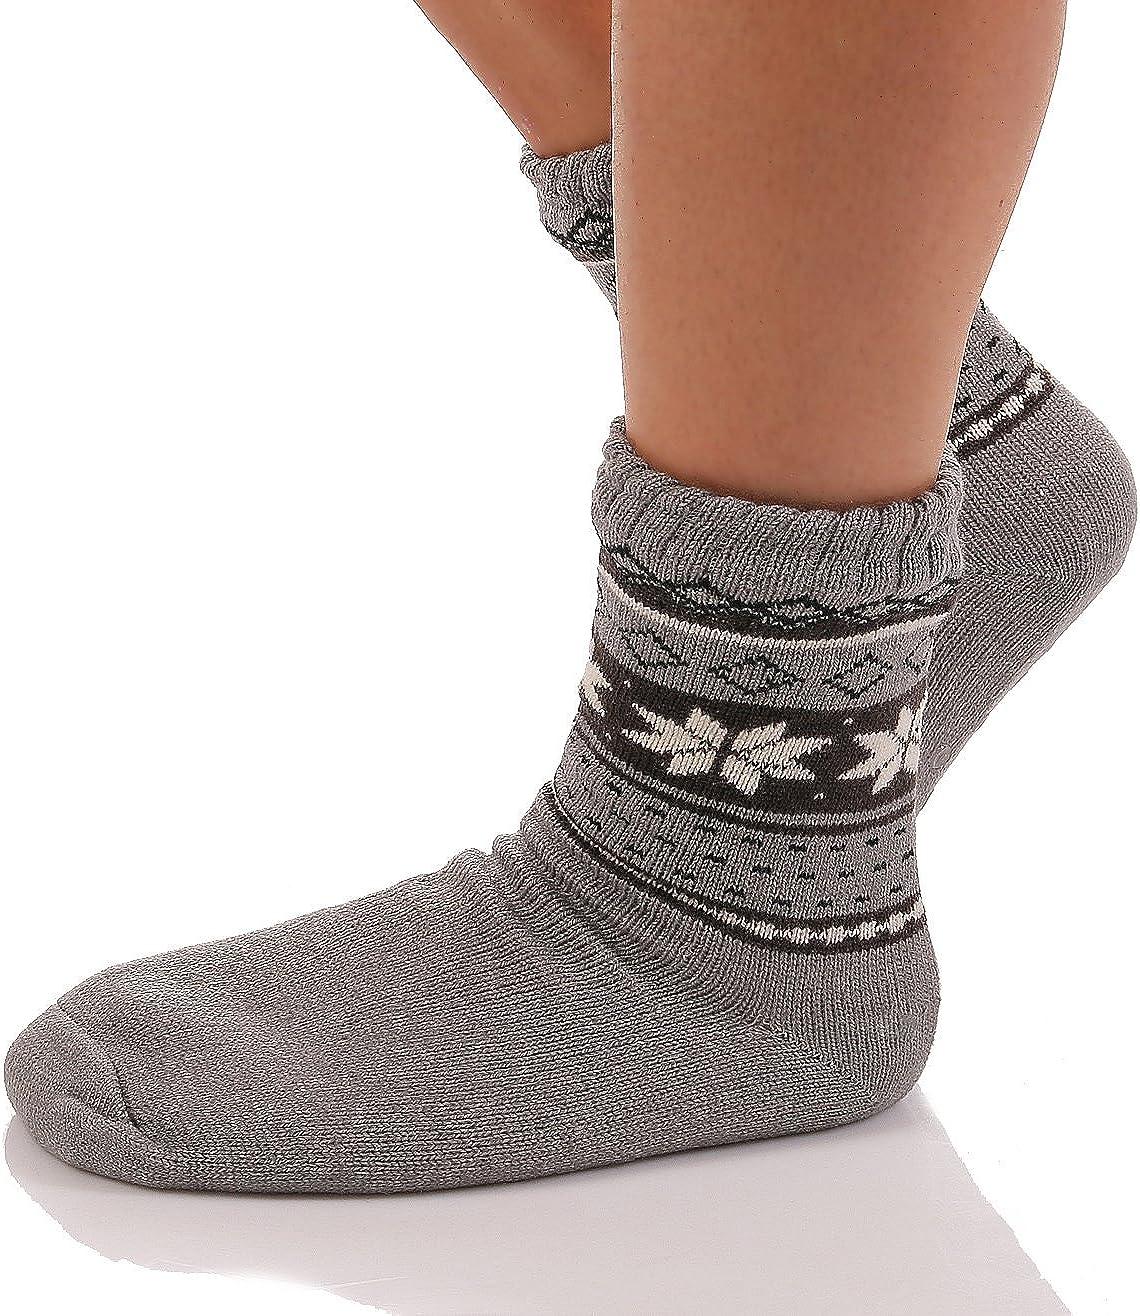 Calze da Donna capanne Pantofole da Uomo capanne Scarpe calda ABS